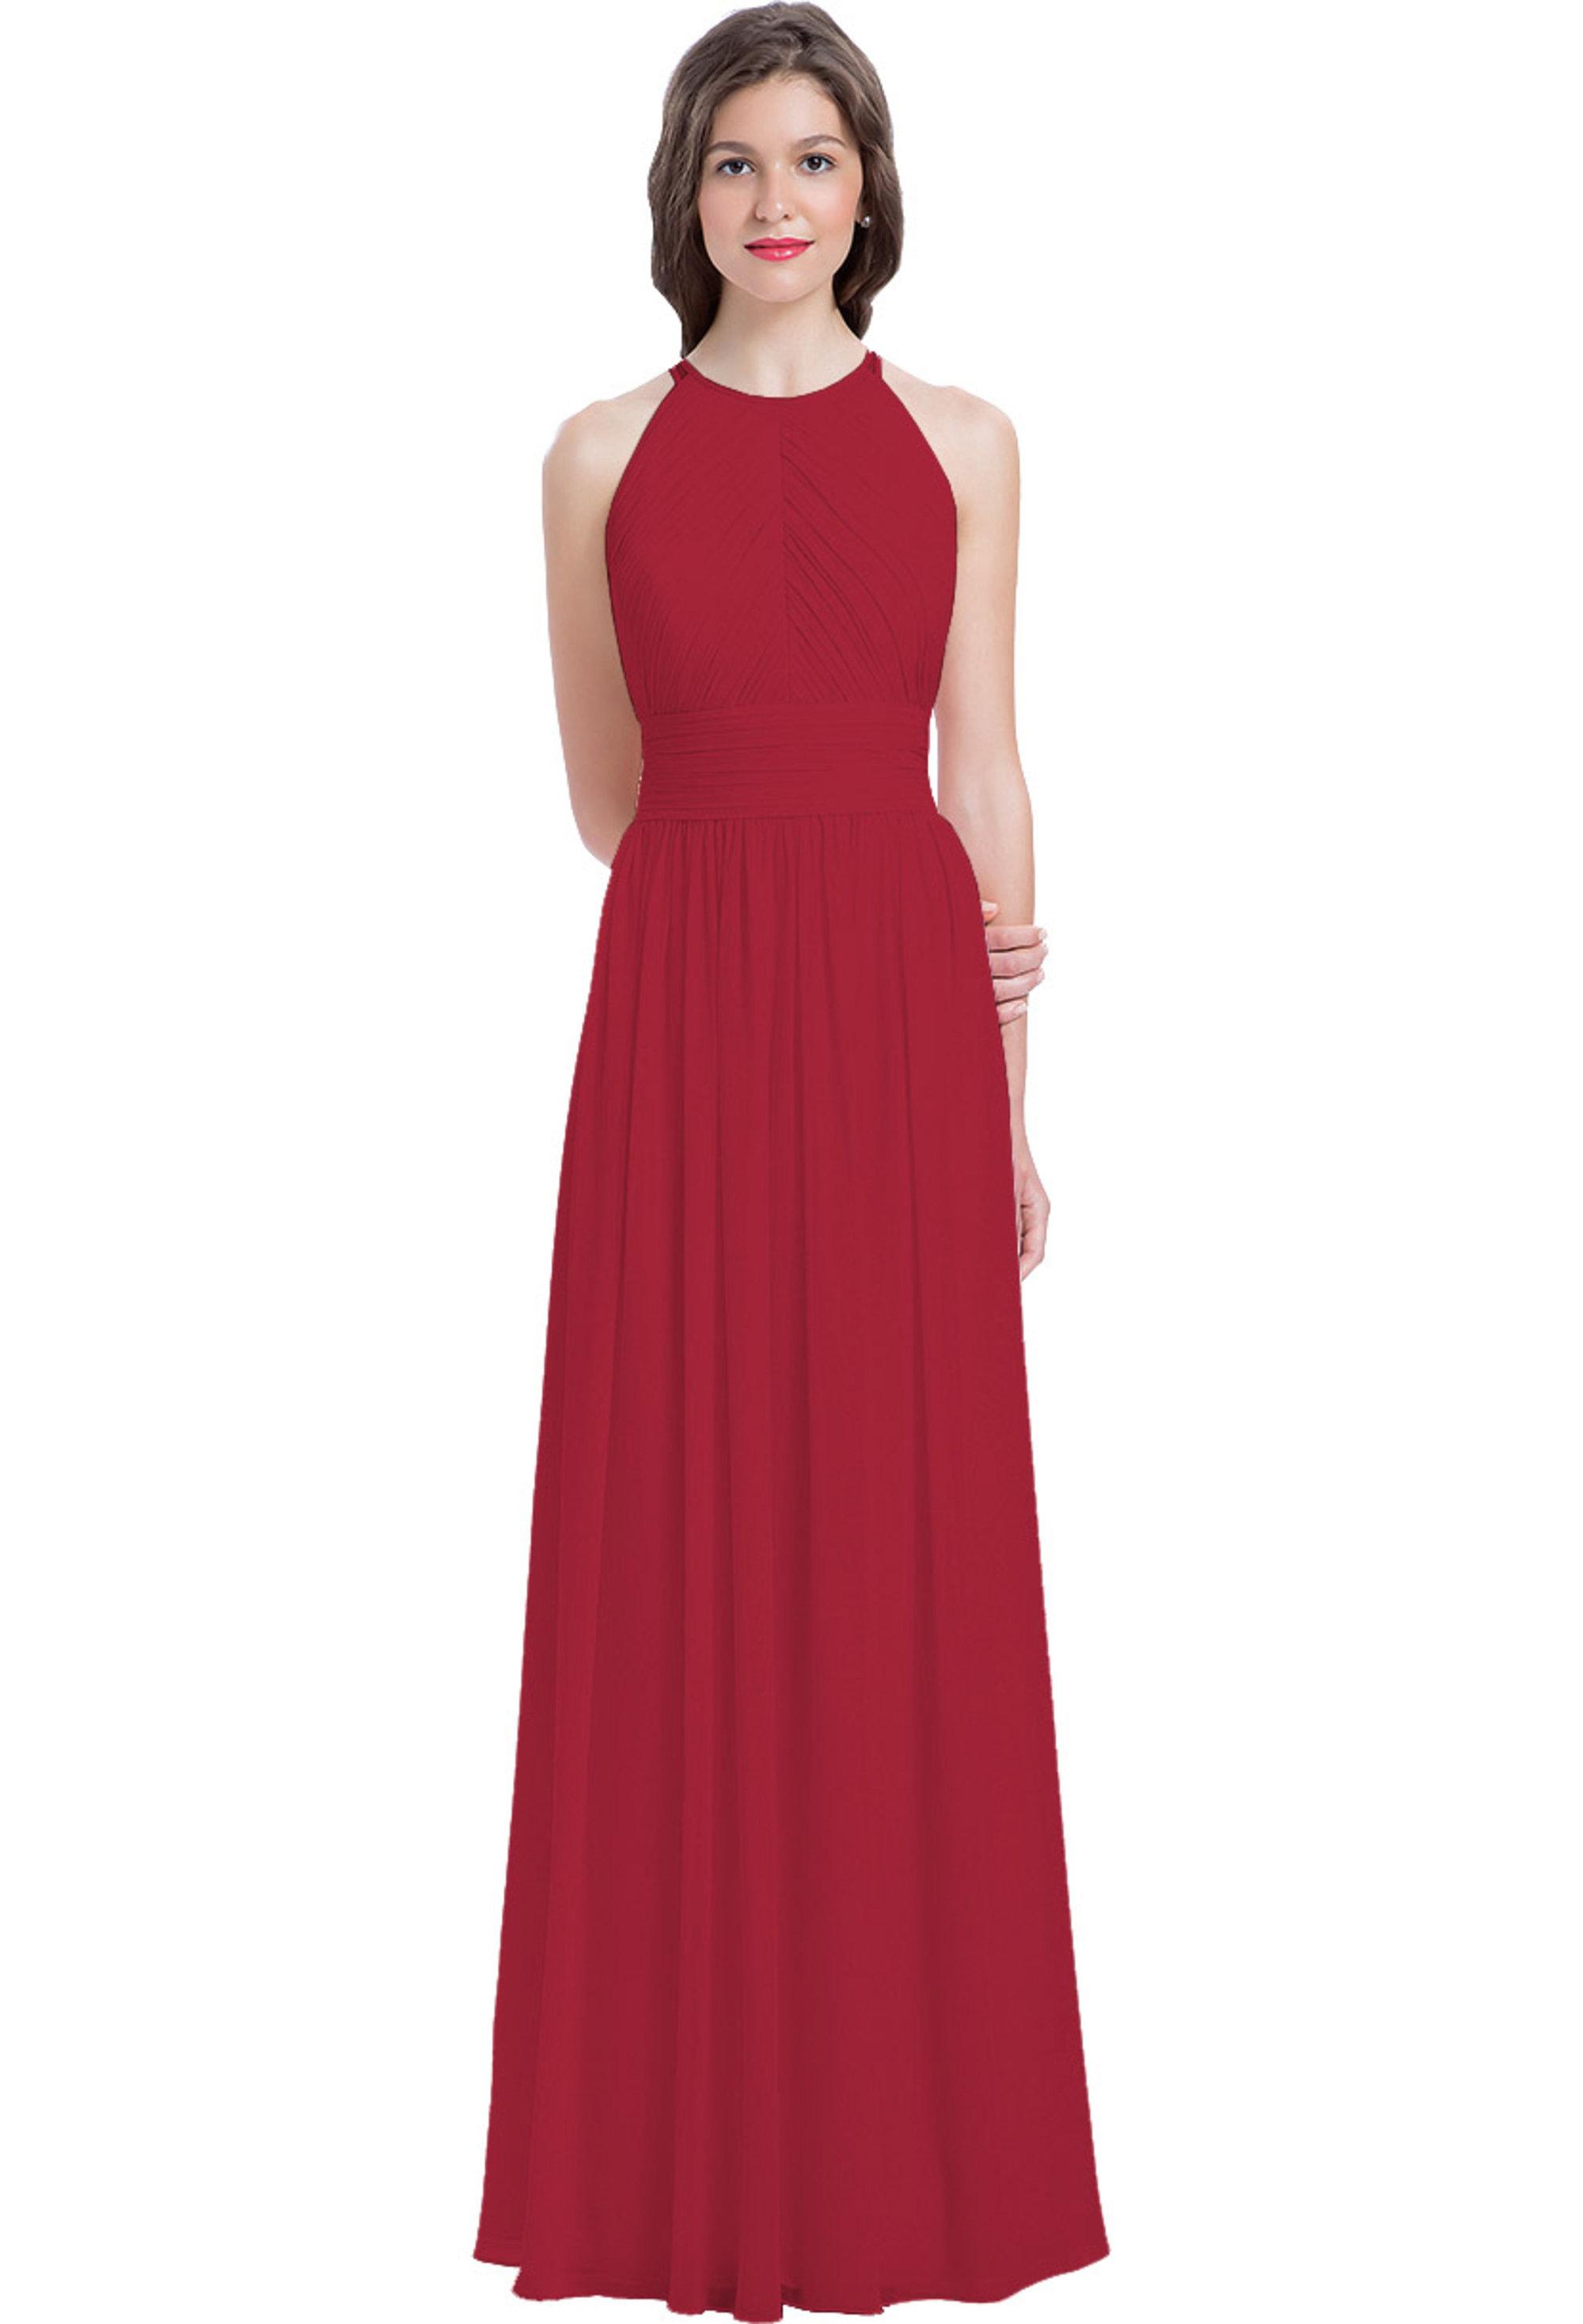 Bill Levkoff CHERRY Chiffon Sleeveless A-line gown, $240.00 Front